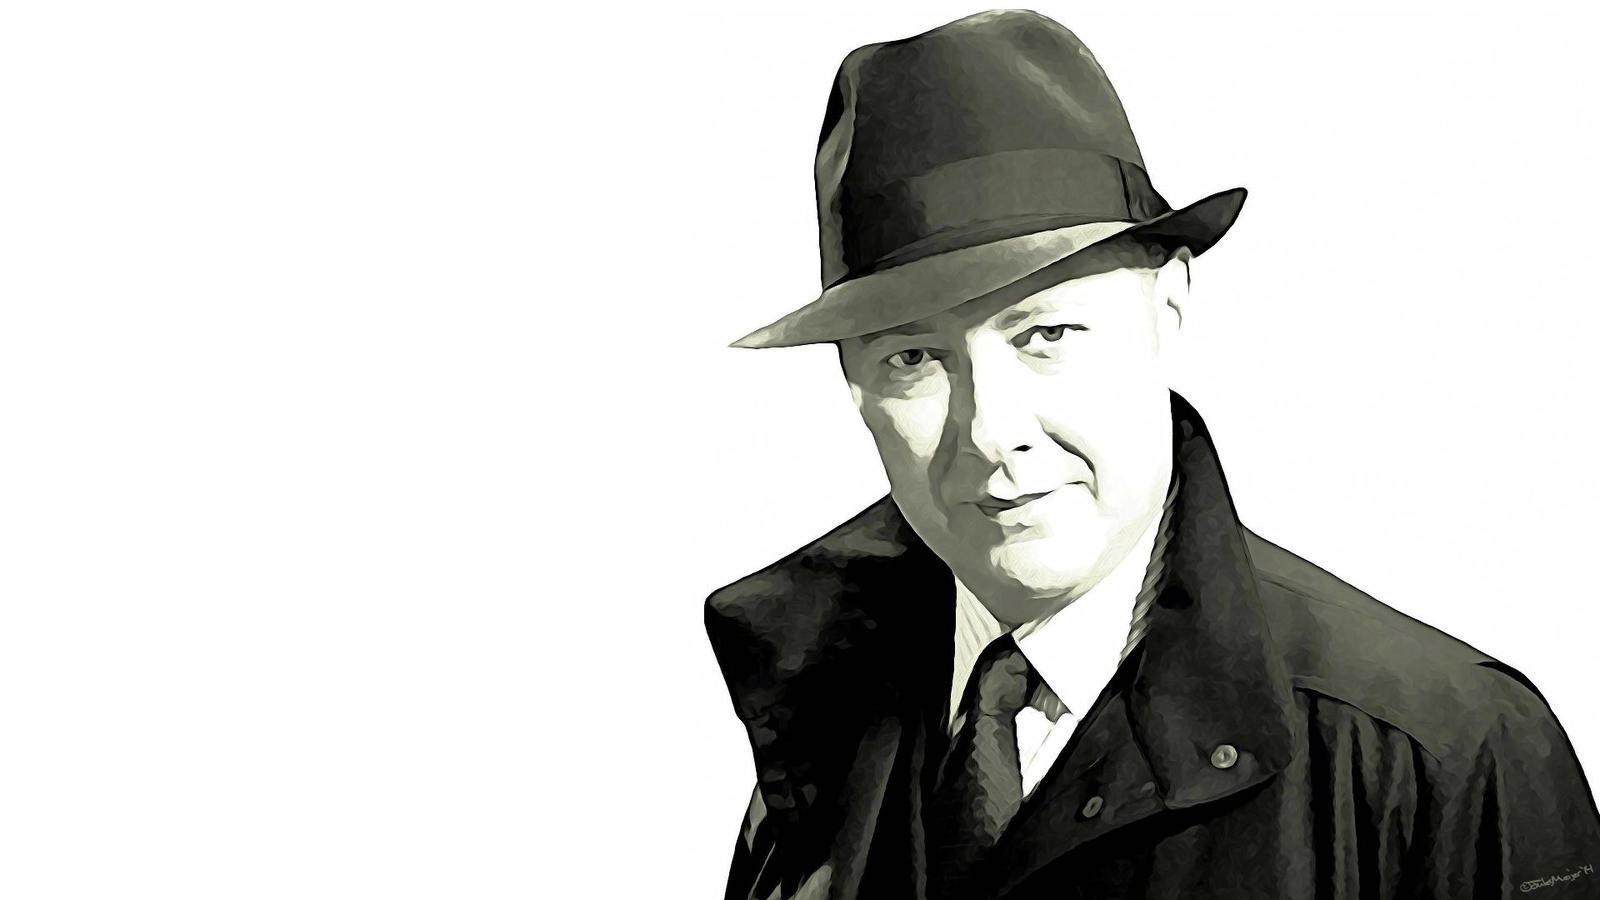 Red Reddington By Julesmeijer On DeviantART